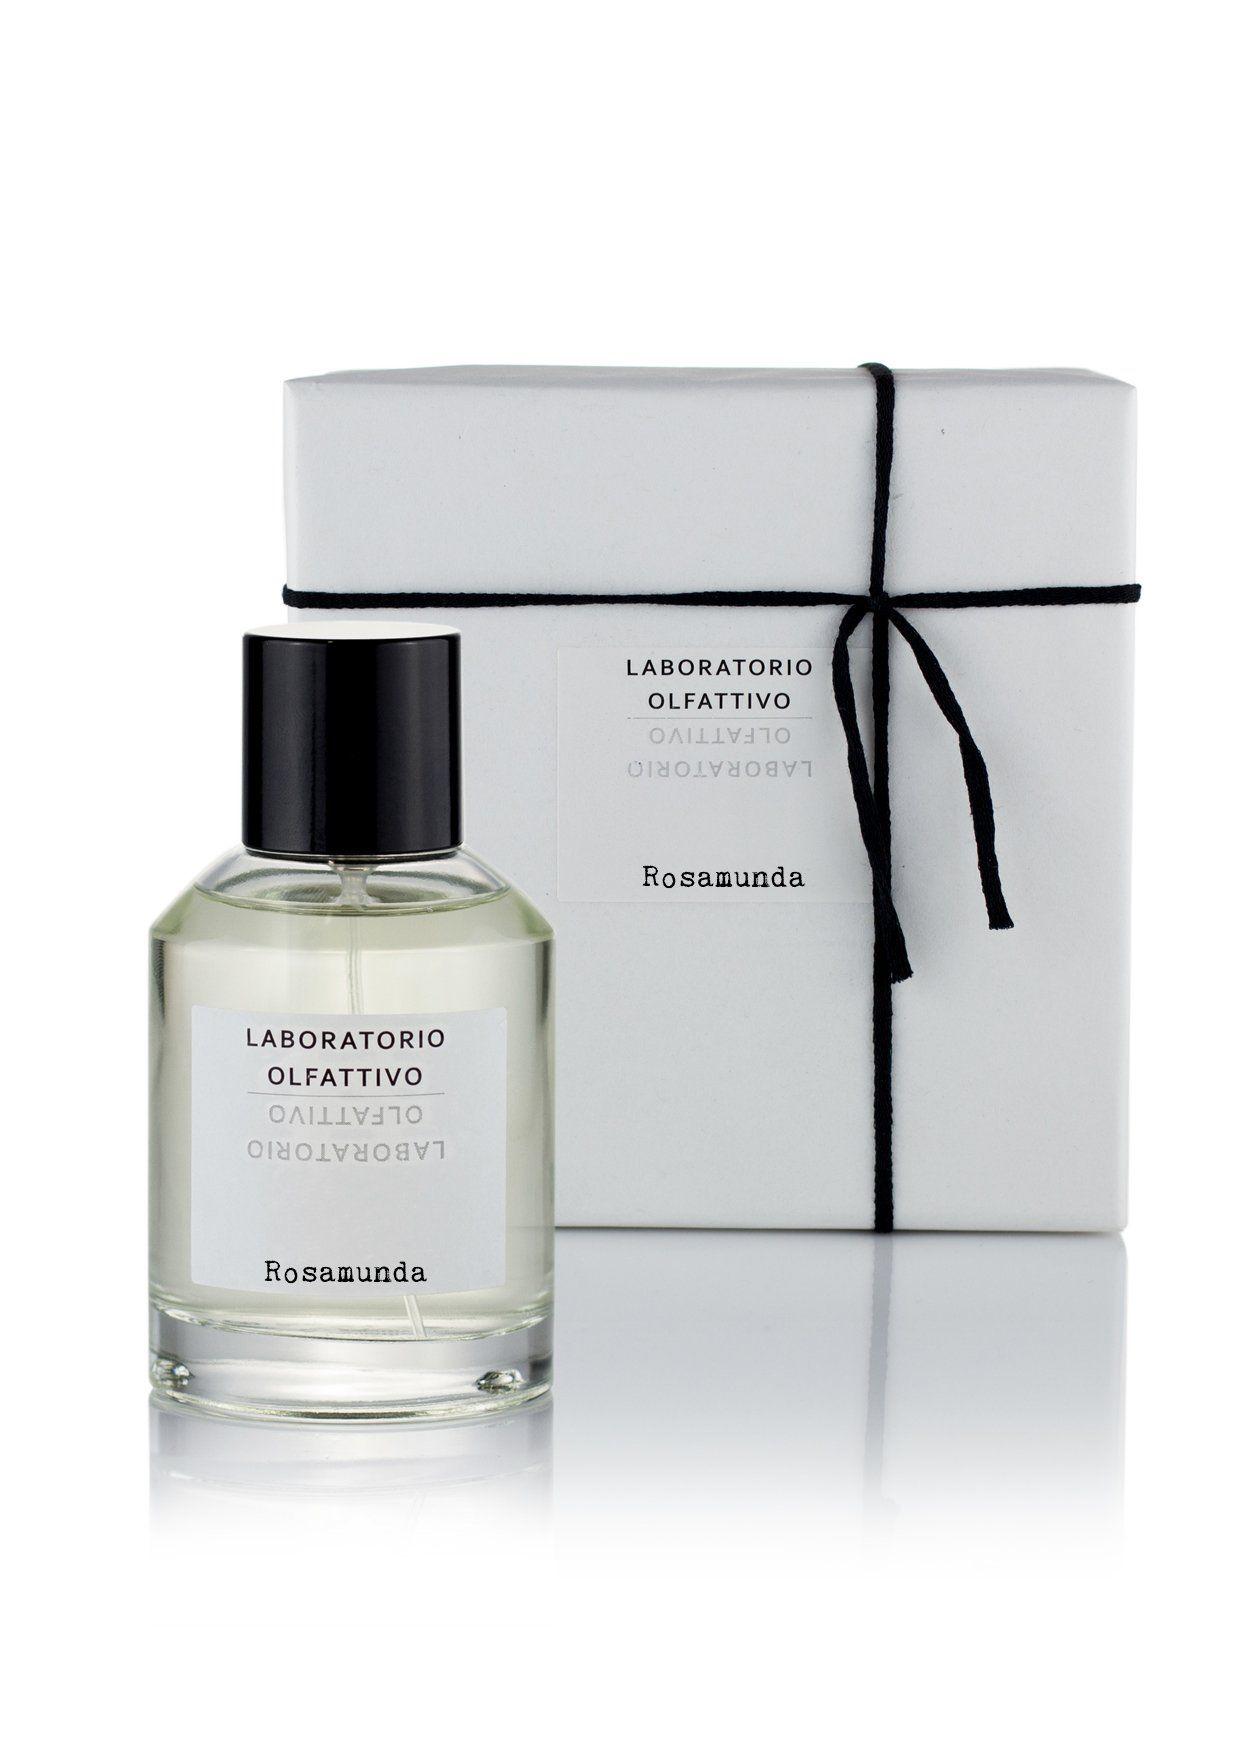 Rosamunda In 2020 With Images Perfume Artisan Perfume Perfume Making